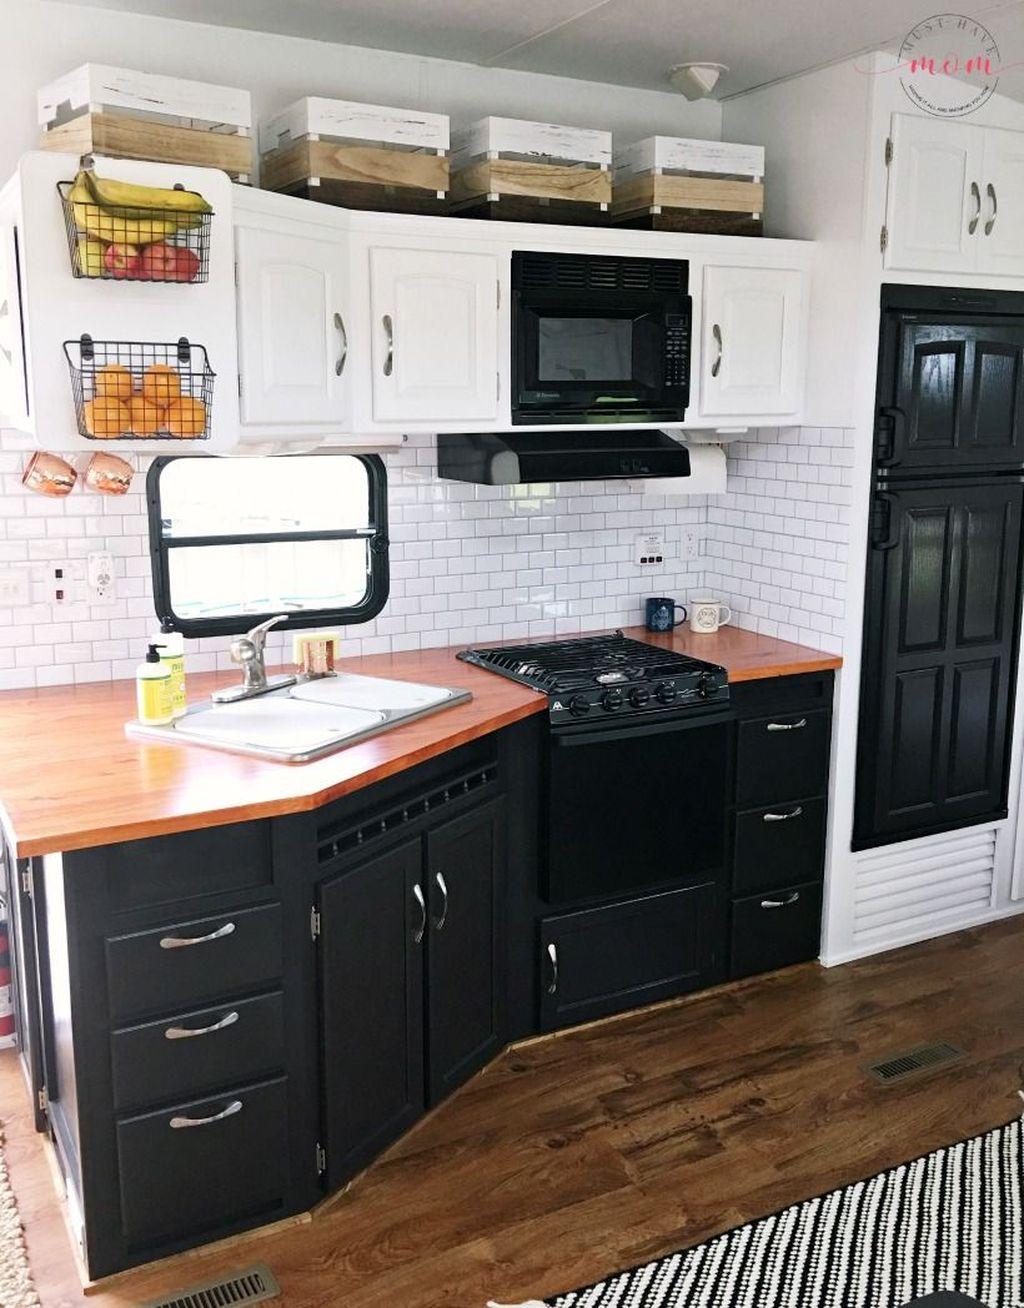 Inspiring RV Kitchen Design And Decor Ideas 04